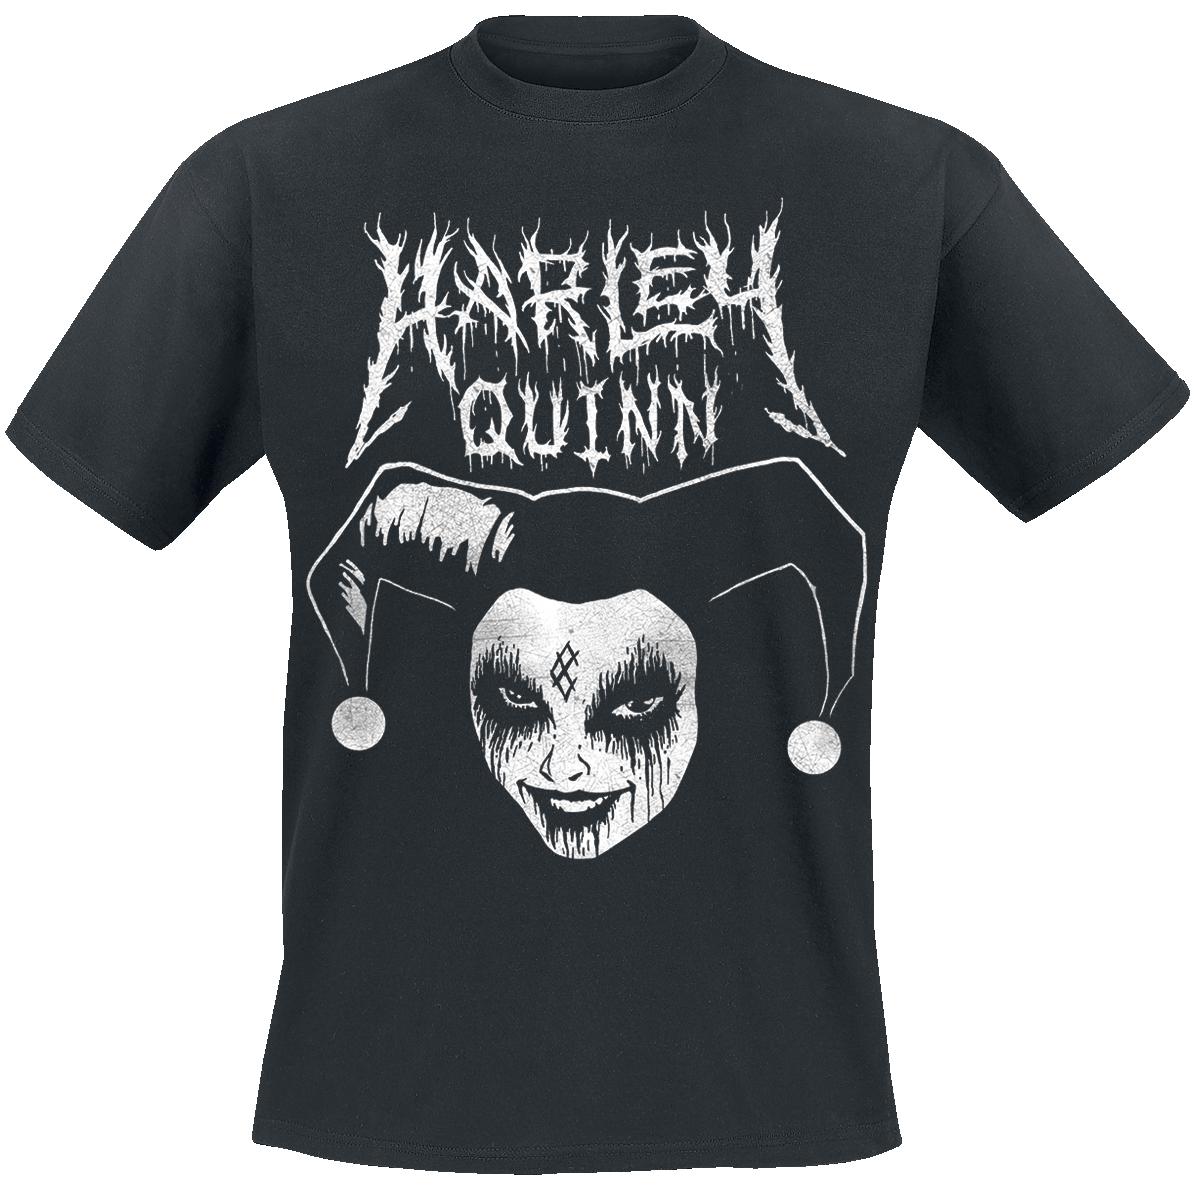 Harley Quinn - Death Metal Harley - T-Shirt - schwarz